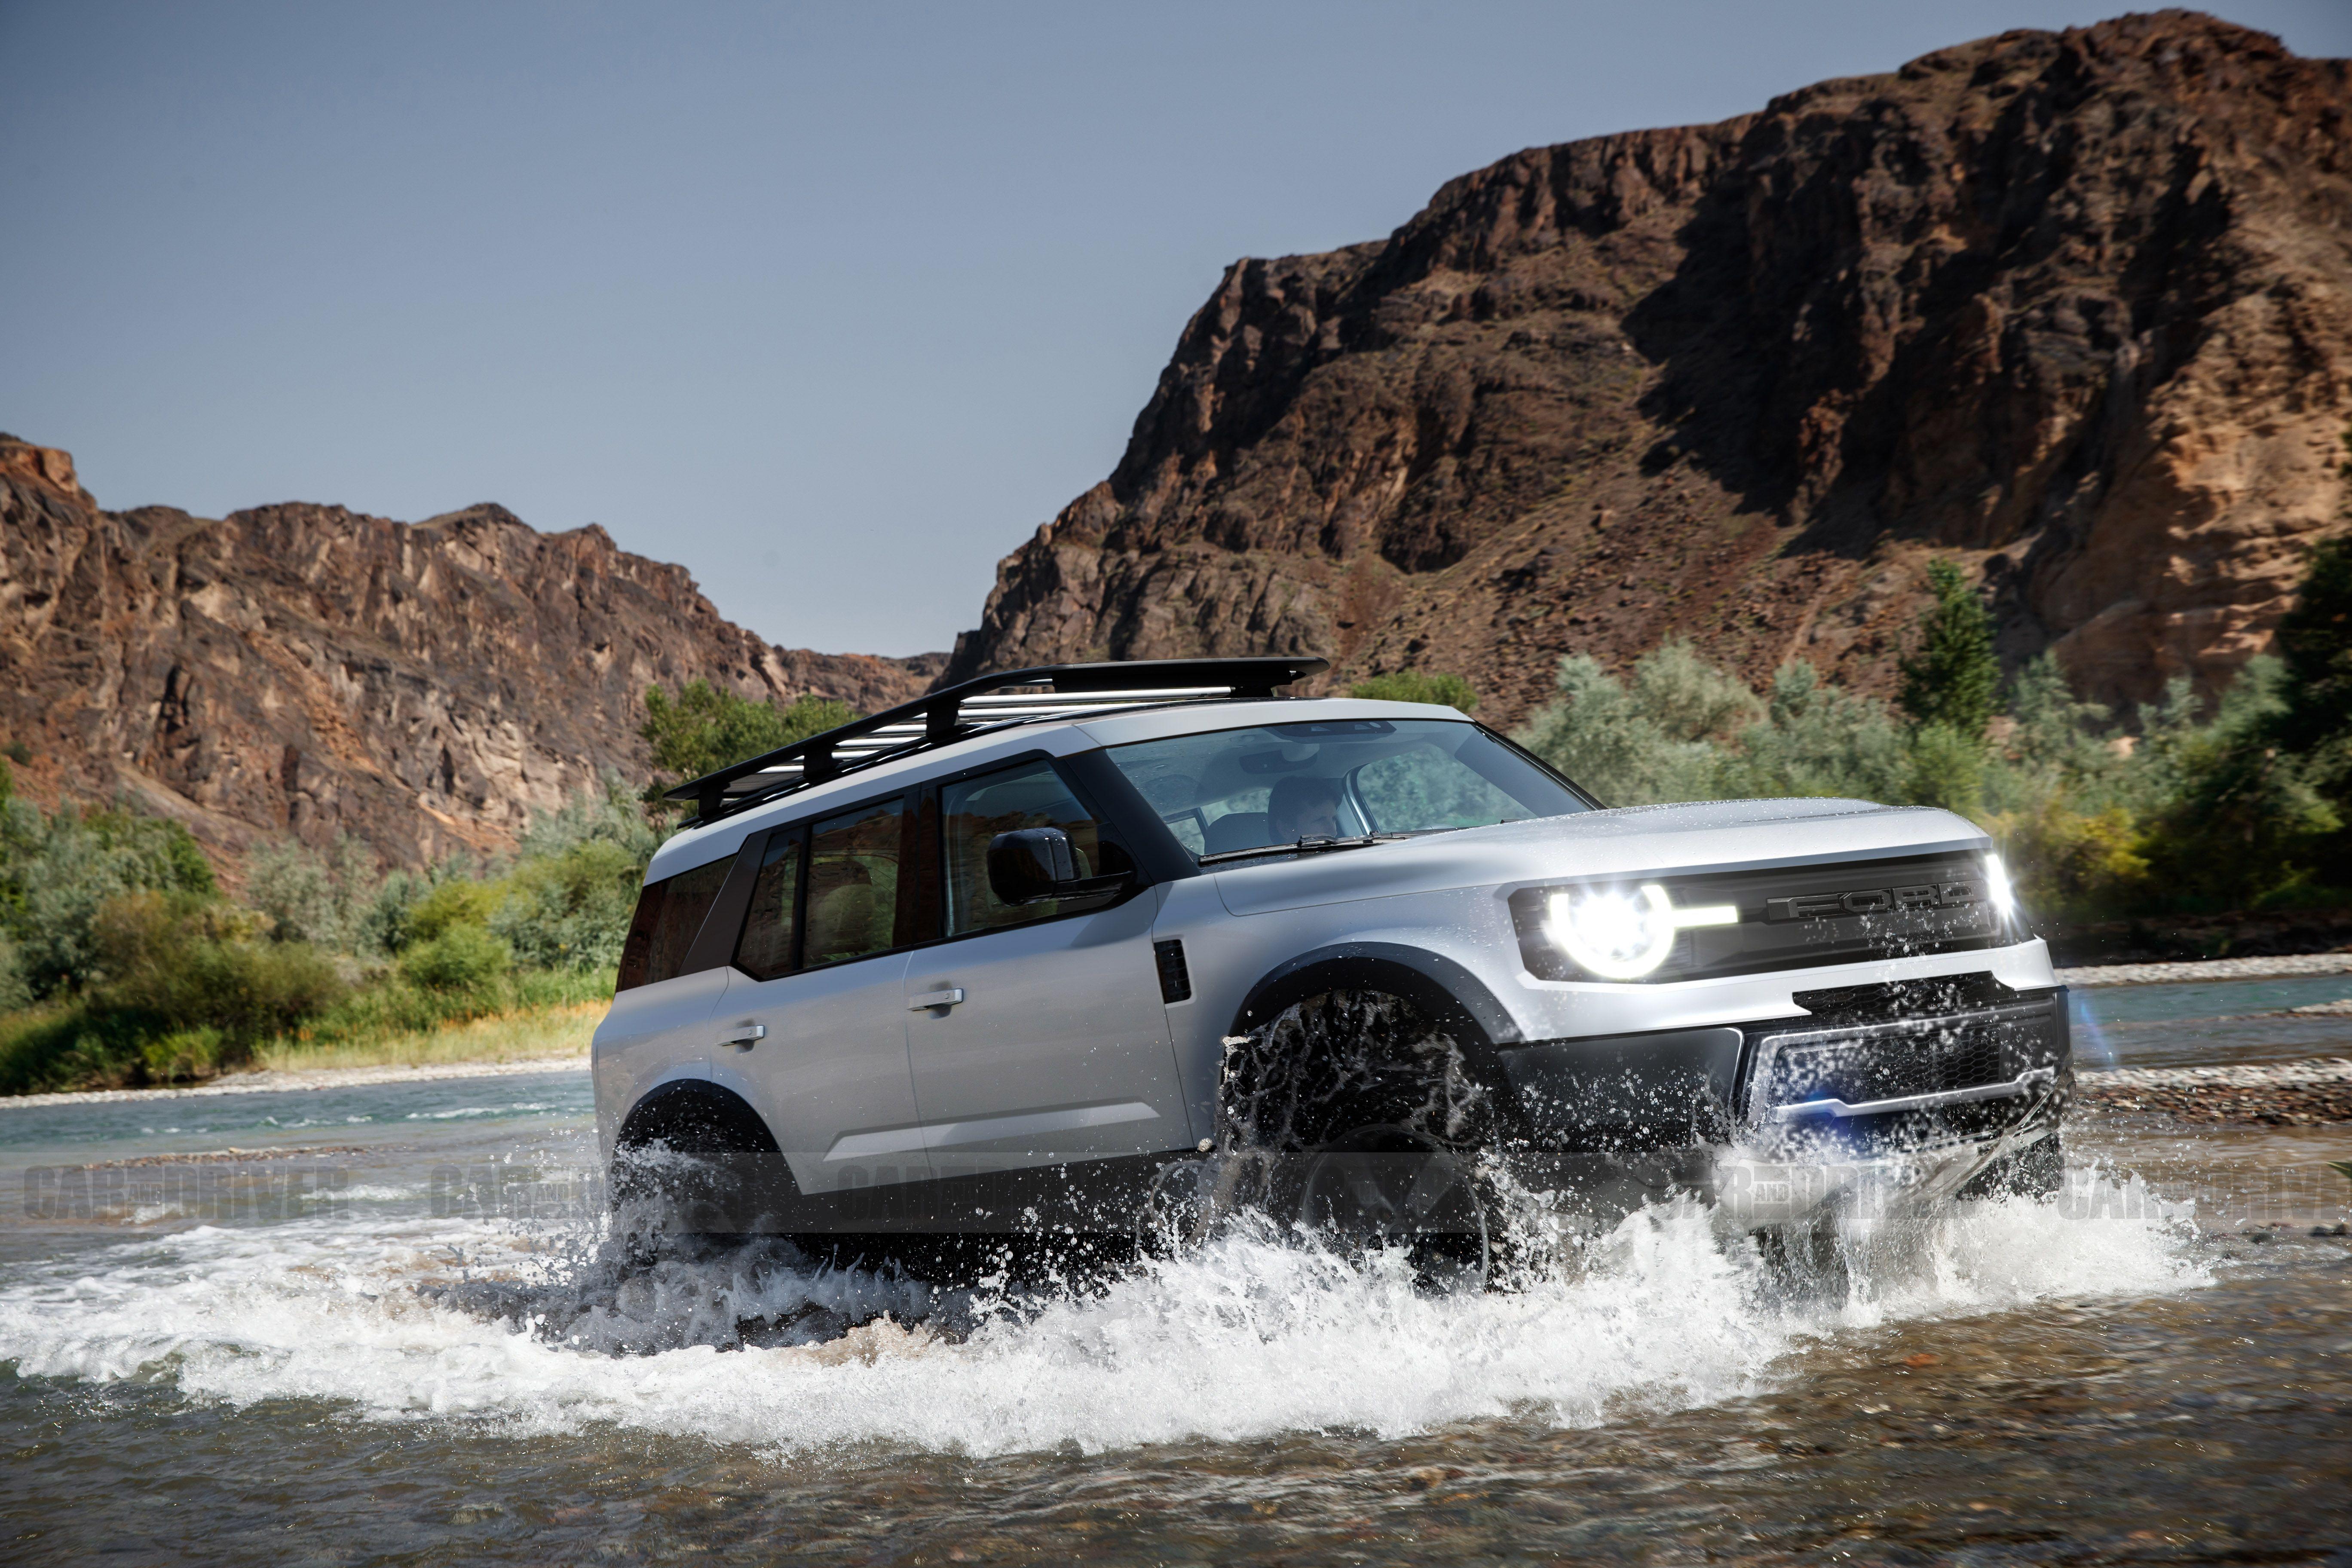 Full Size Bronco Concept Ford Bronco Ford Suv Bronco Truck